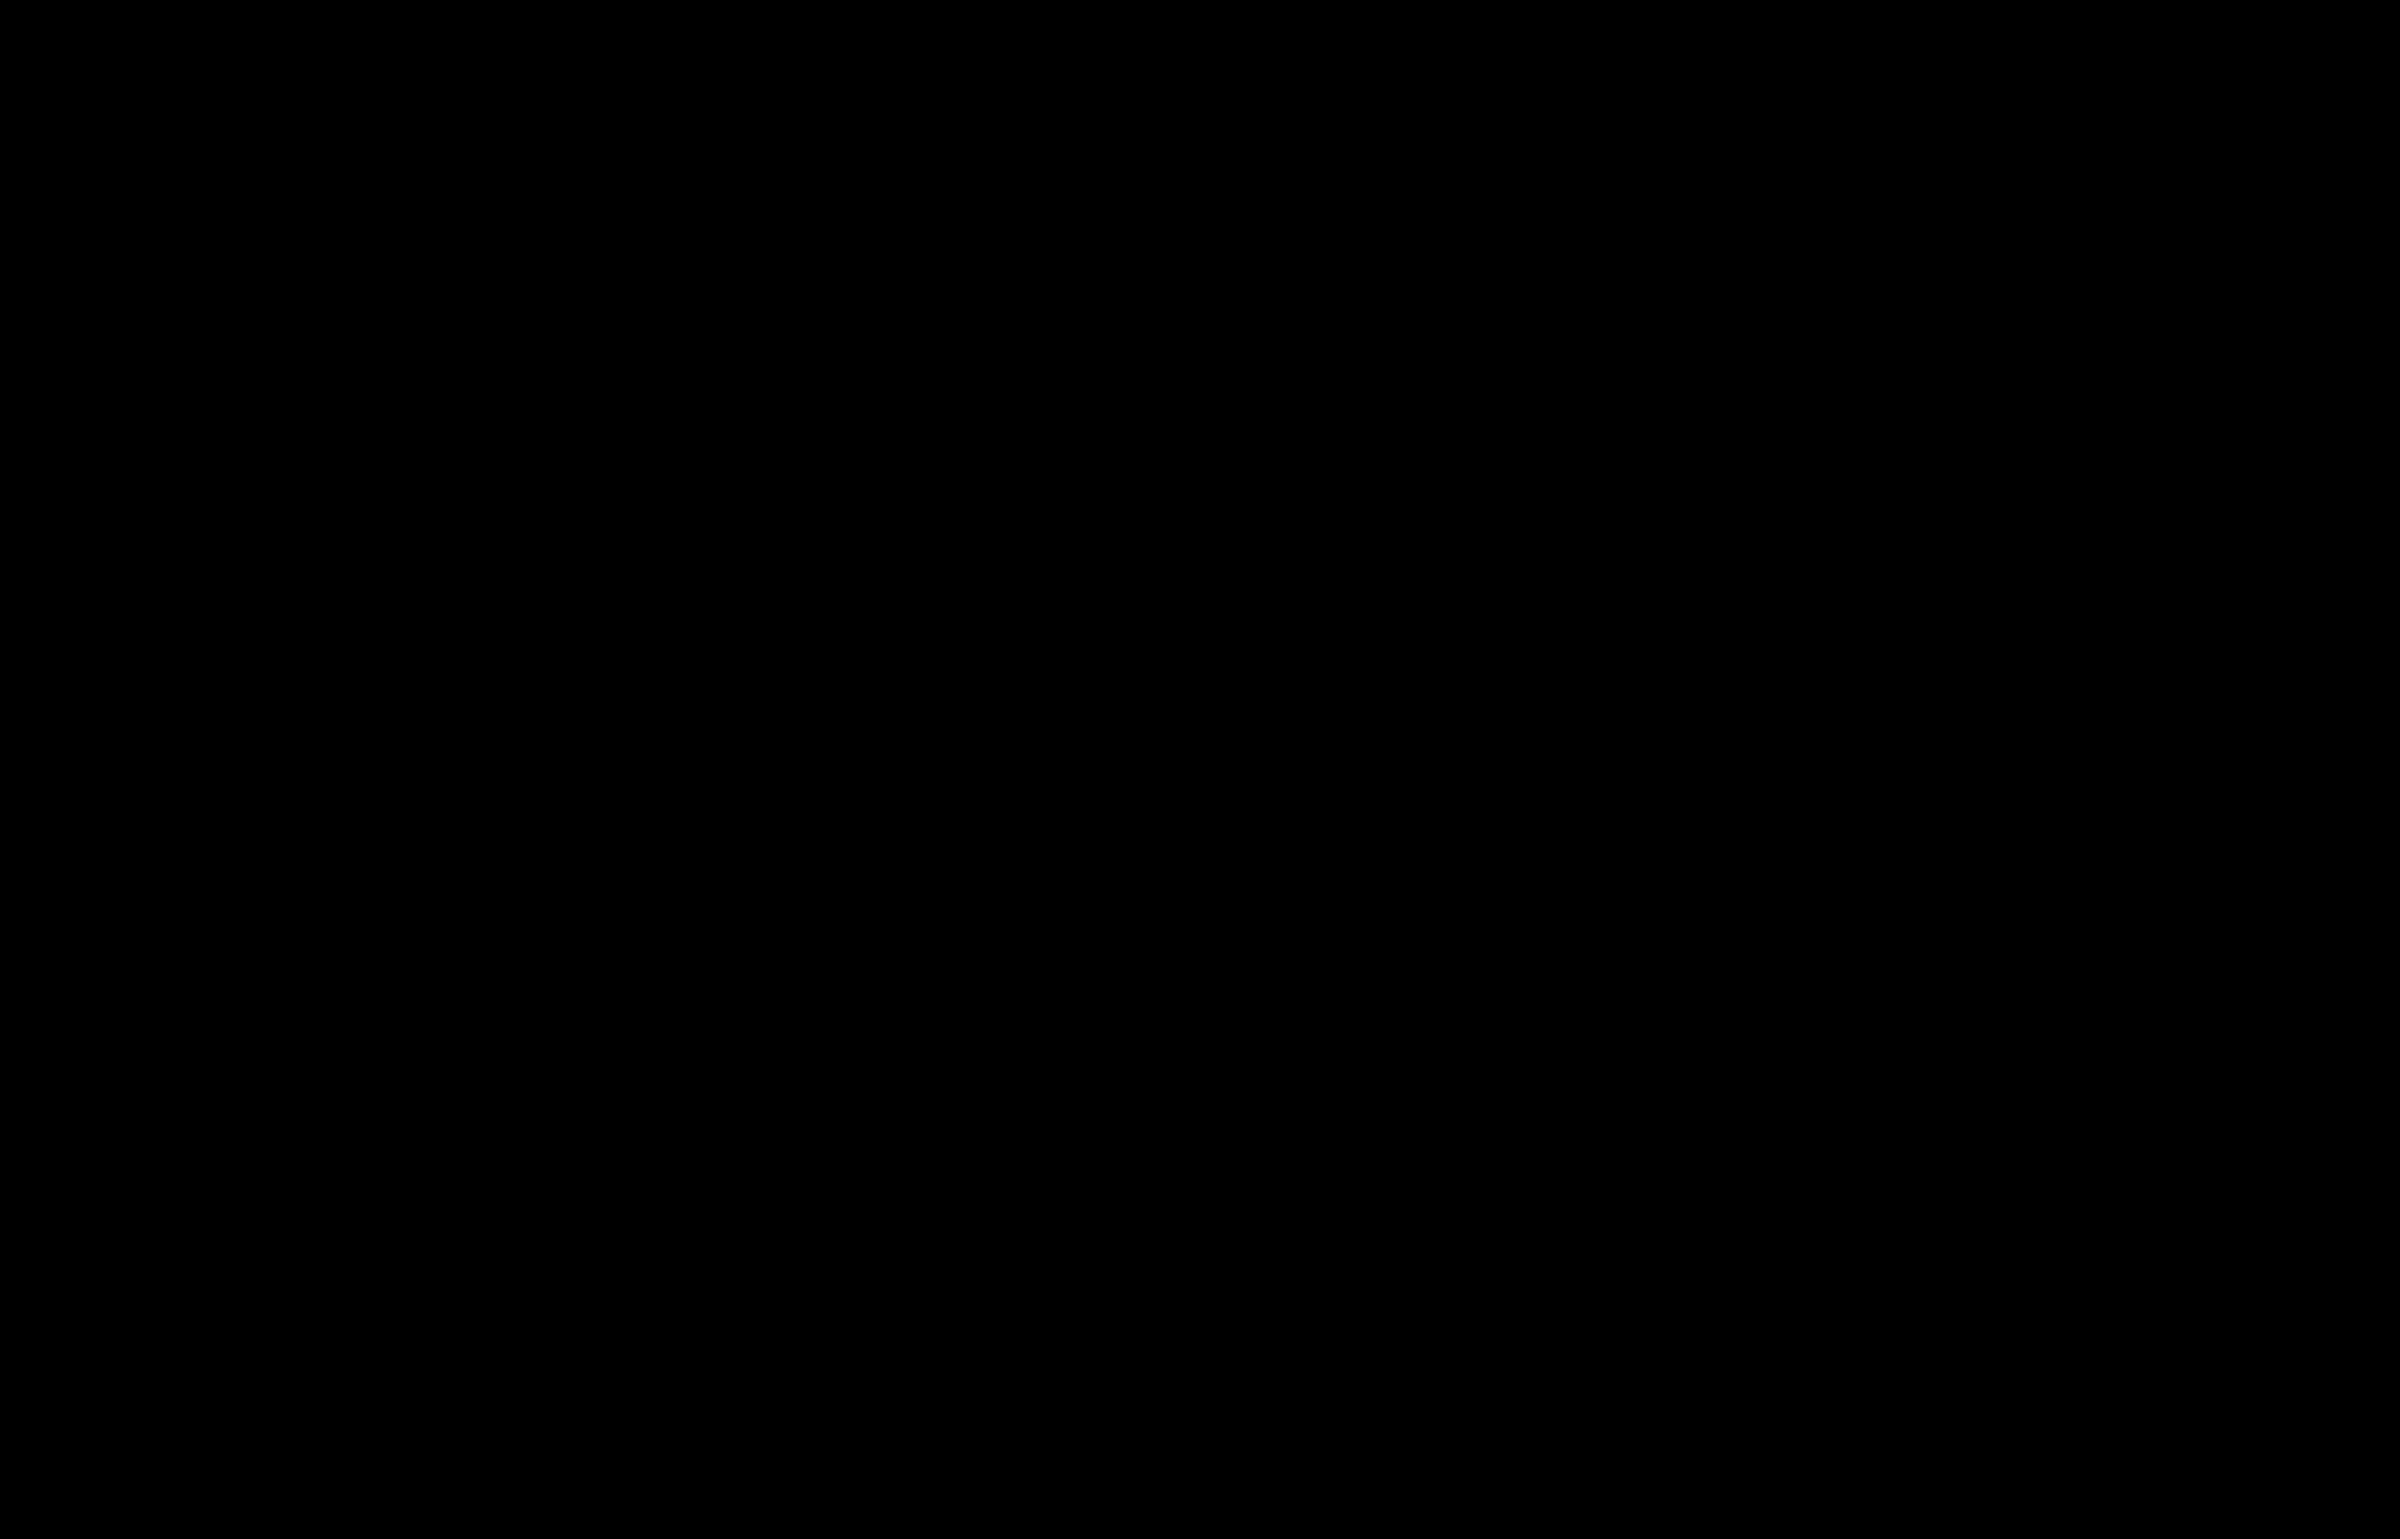 mtv-logo-png-transparent.png